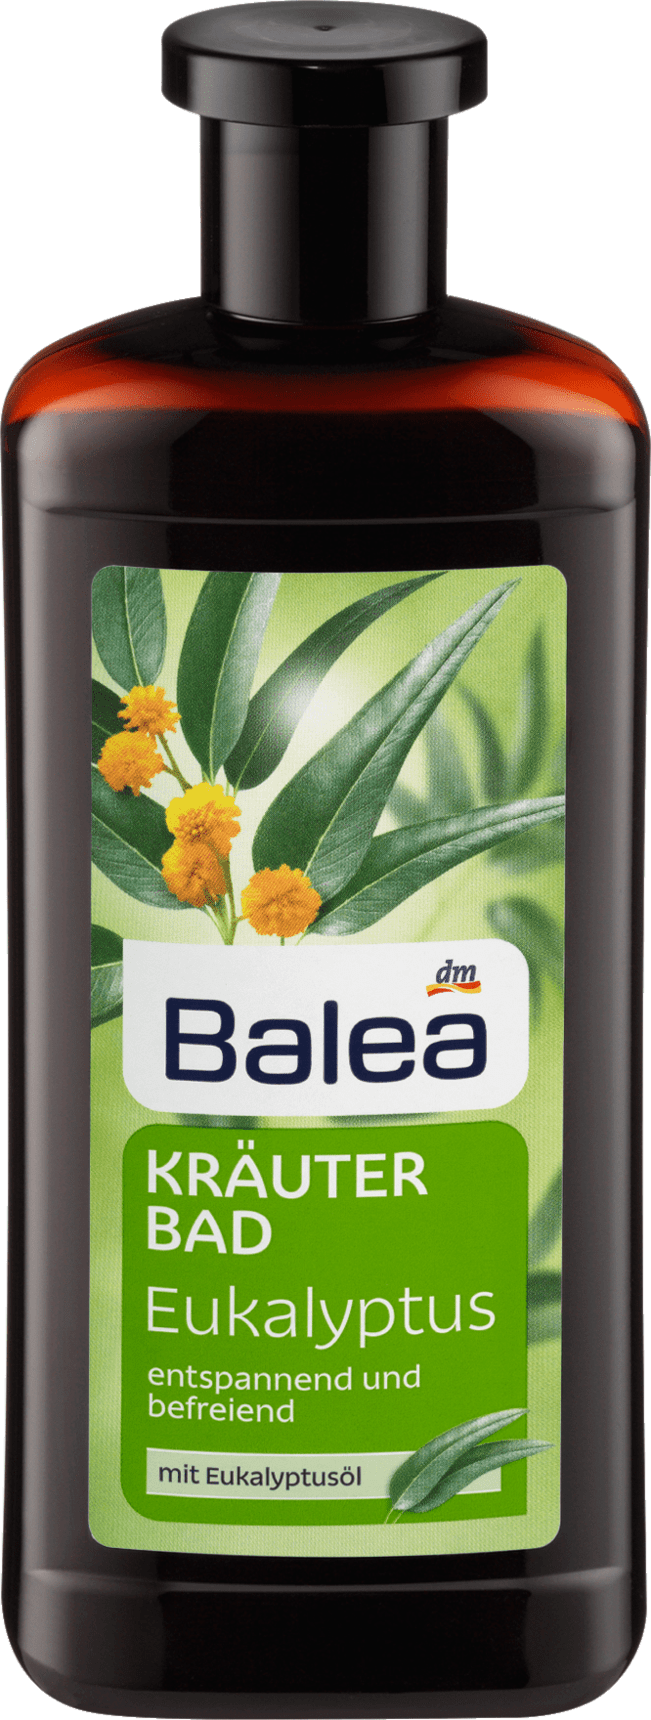 Balea Bain aux herbes eucalyptus, 500 ml